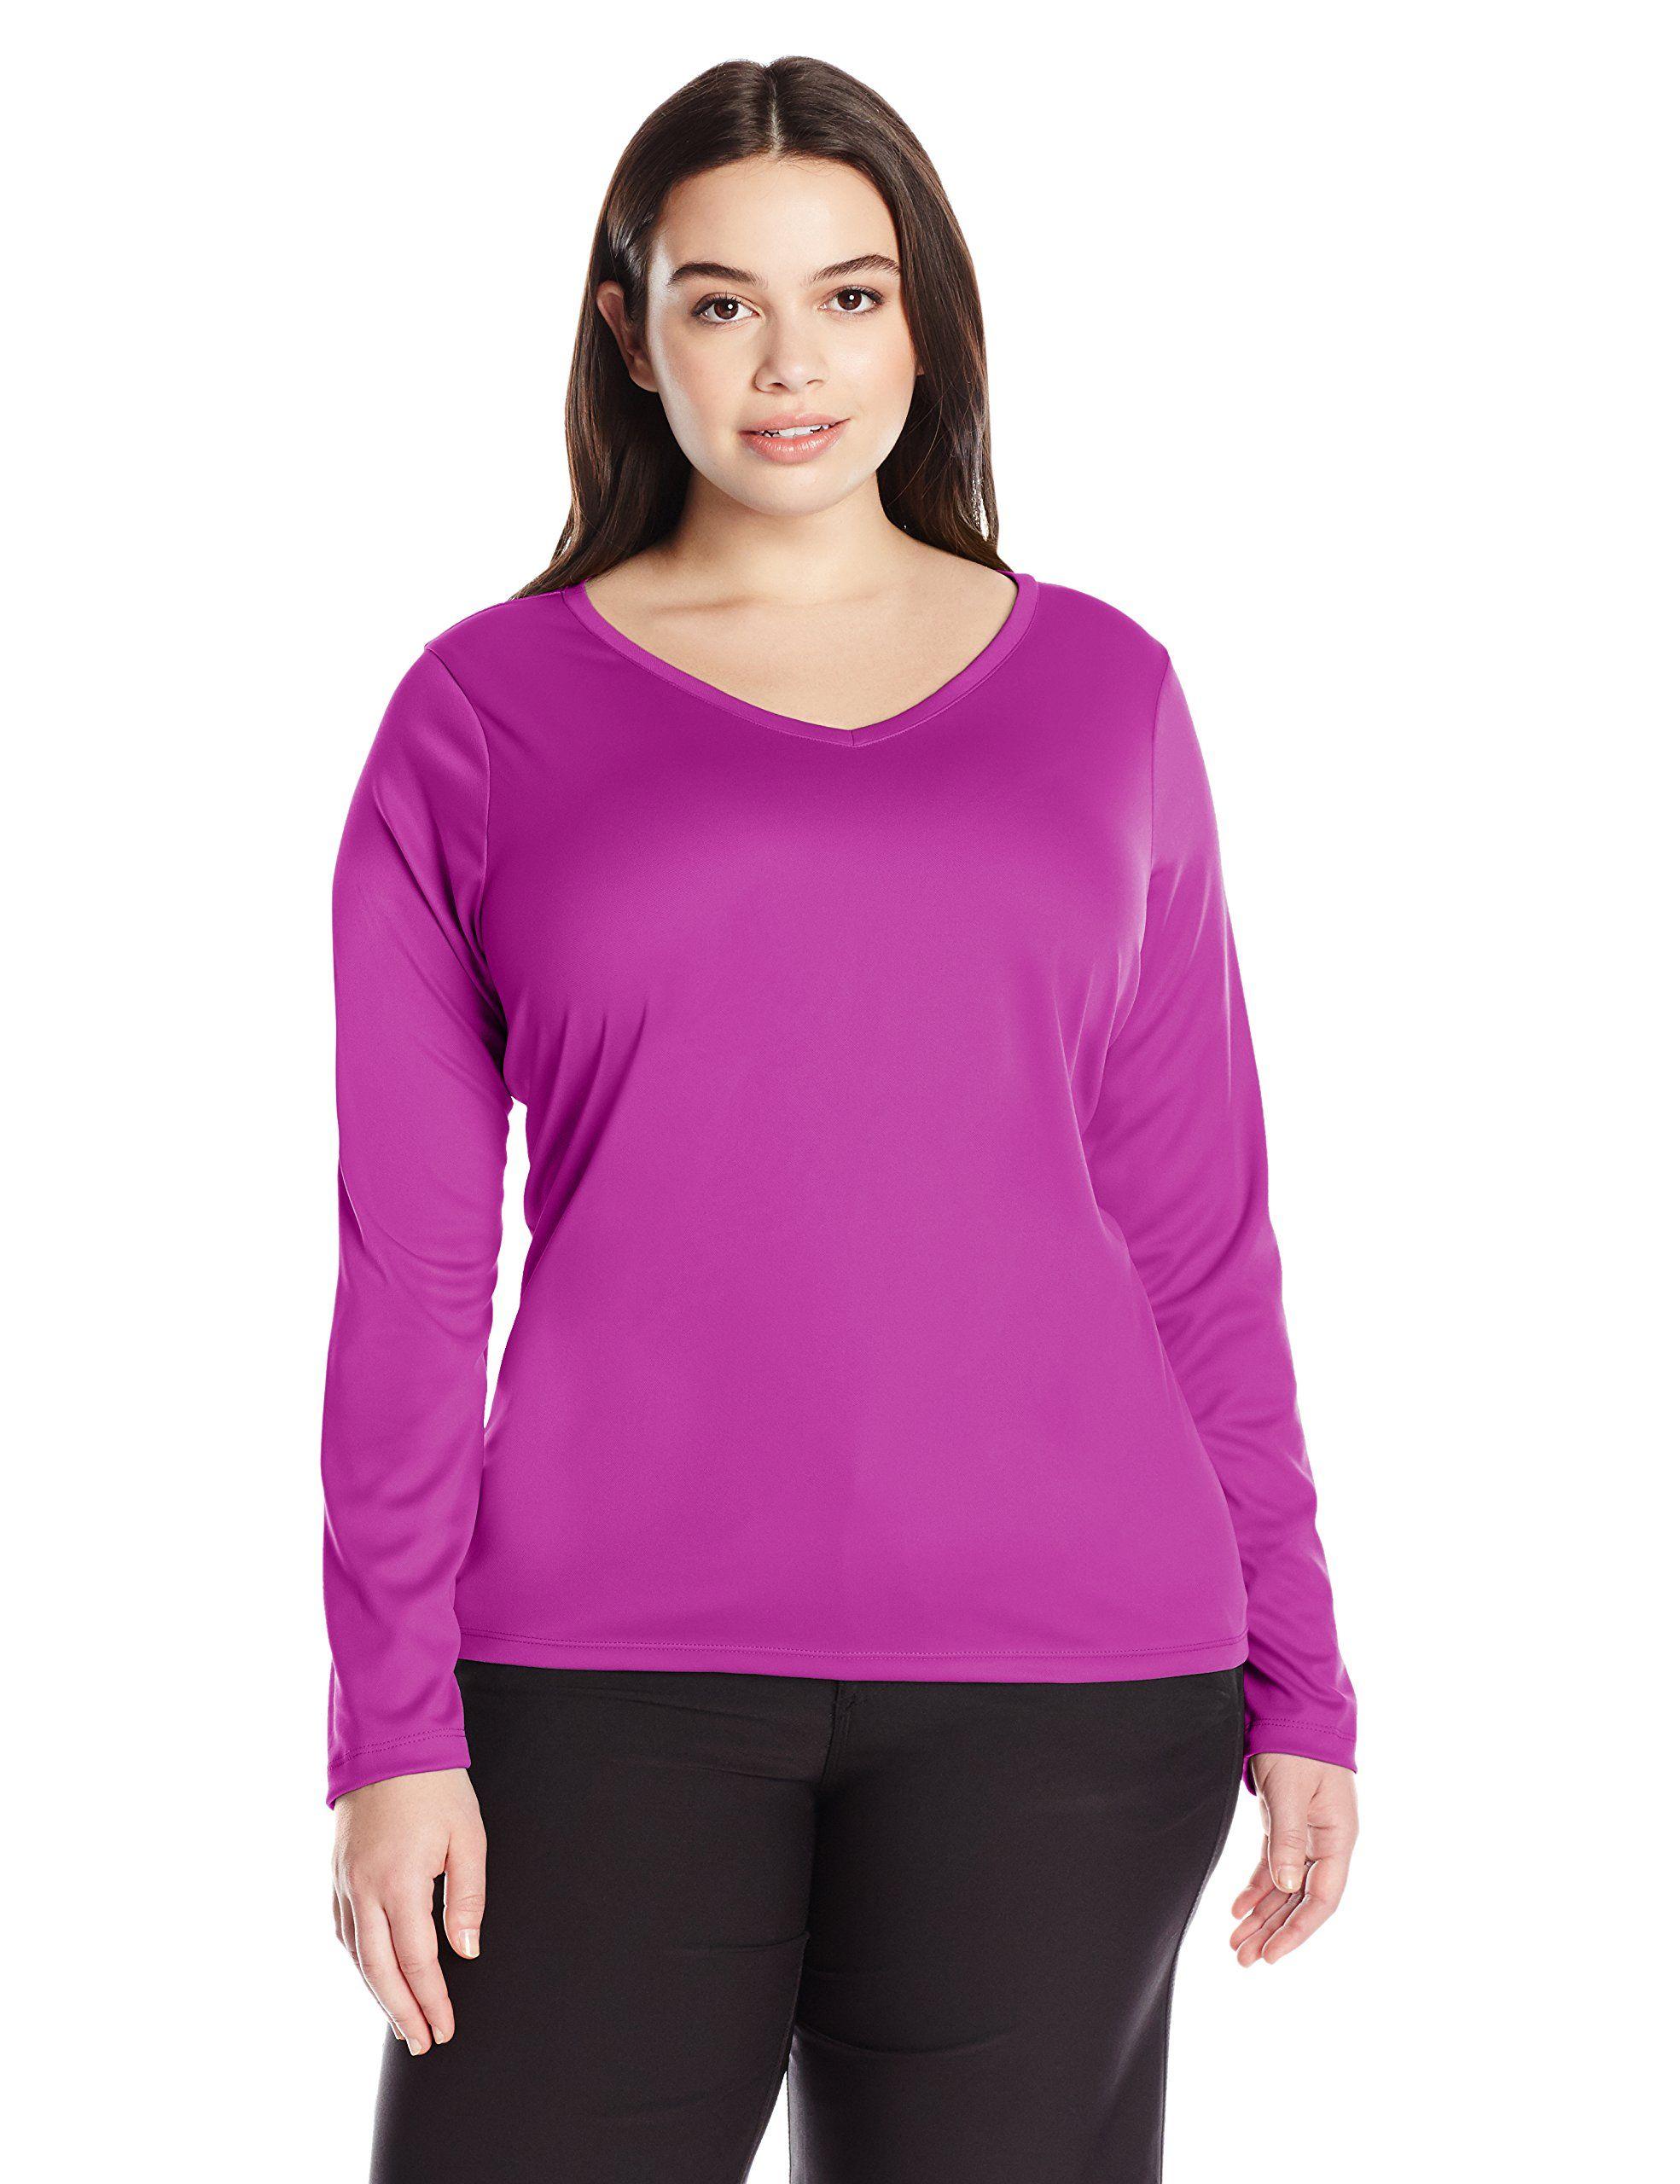 e400acb7c5d Kanu Surf Women s Plus Size Solid Upf 50+ Long Sleeve Swim Shirt Rashguard